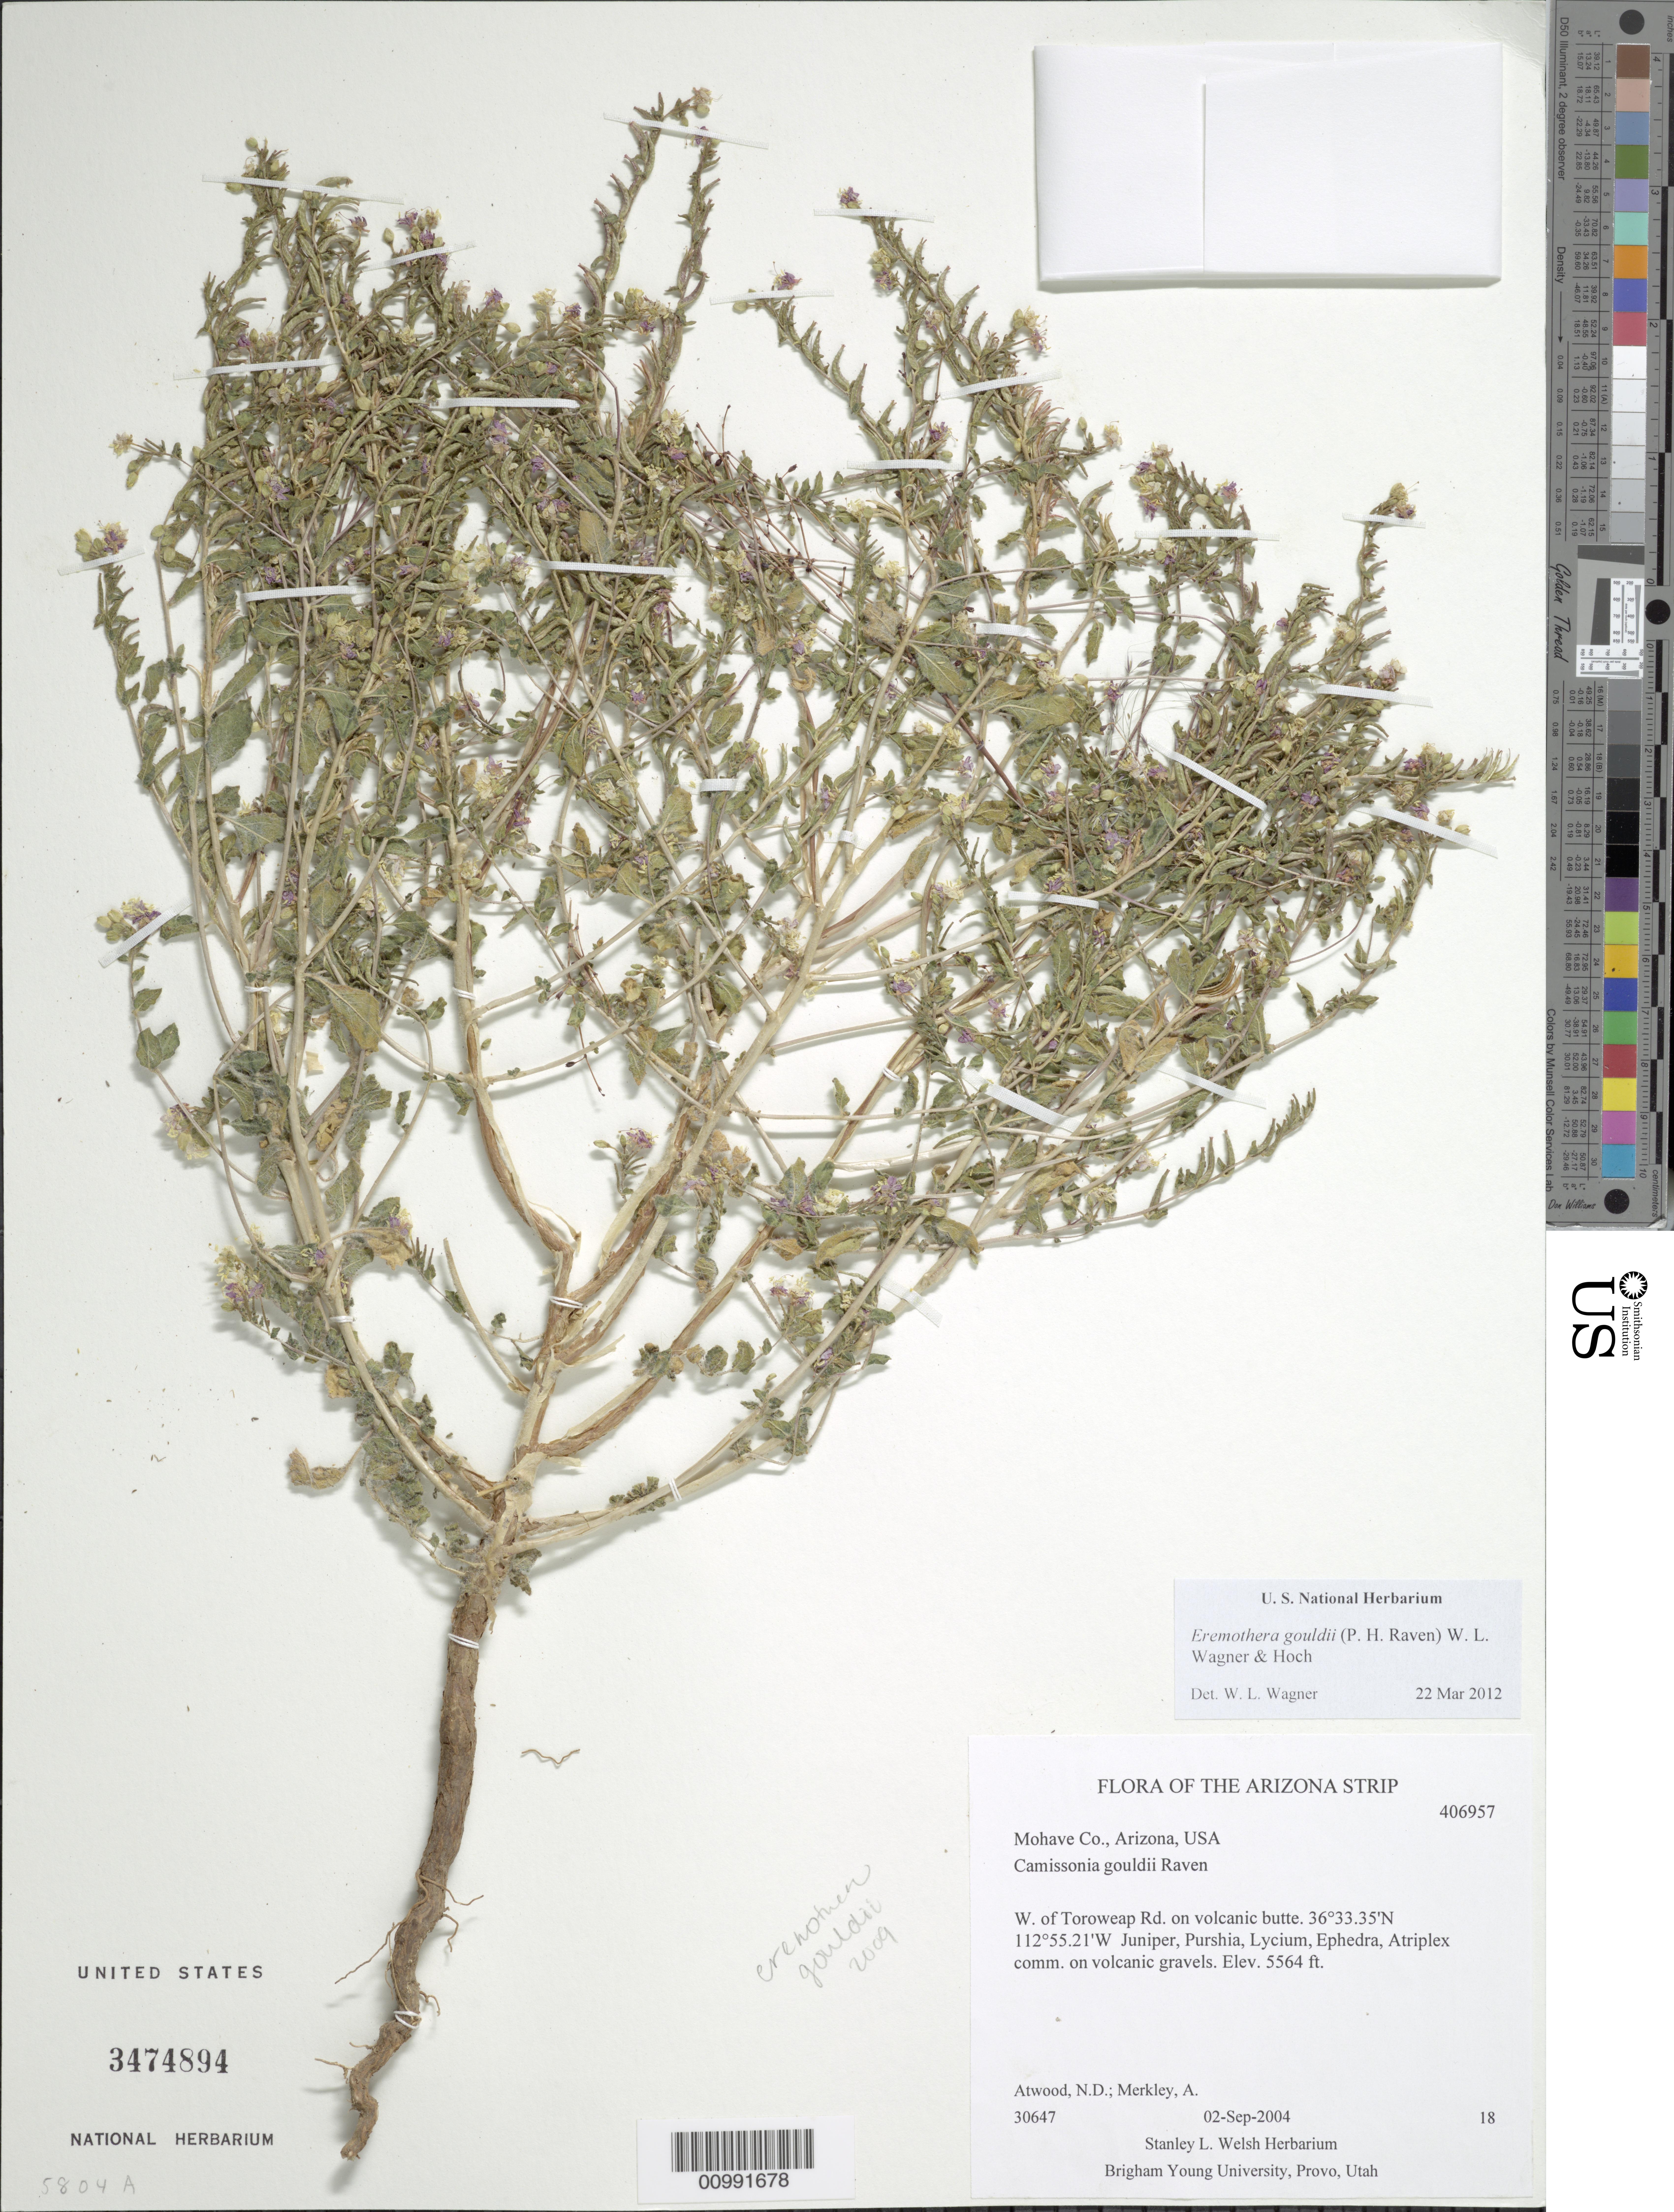 Eremothera gouldii (P.H. Raven) W.L. Wagner & Hoch